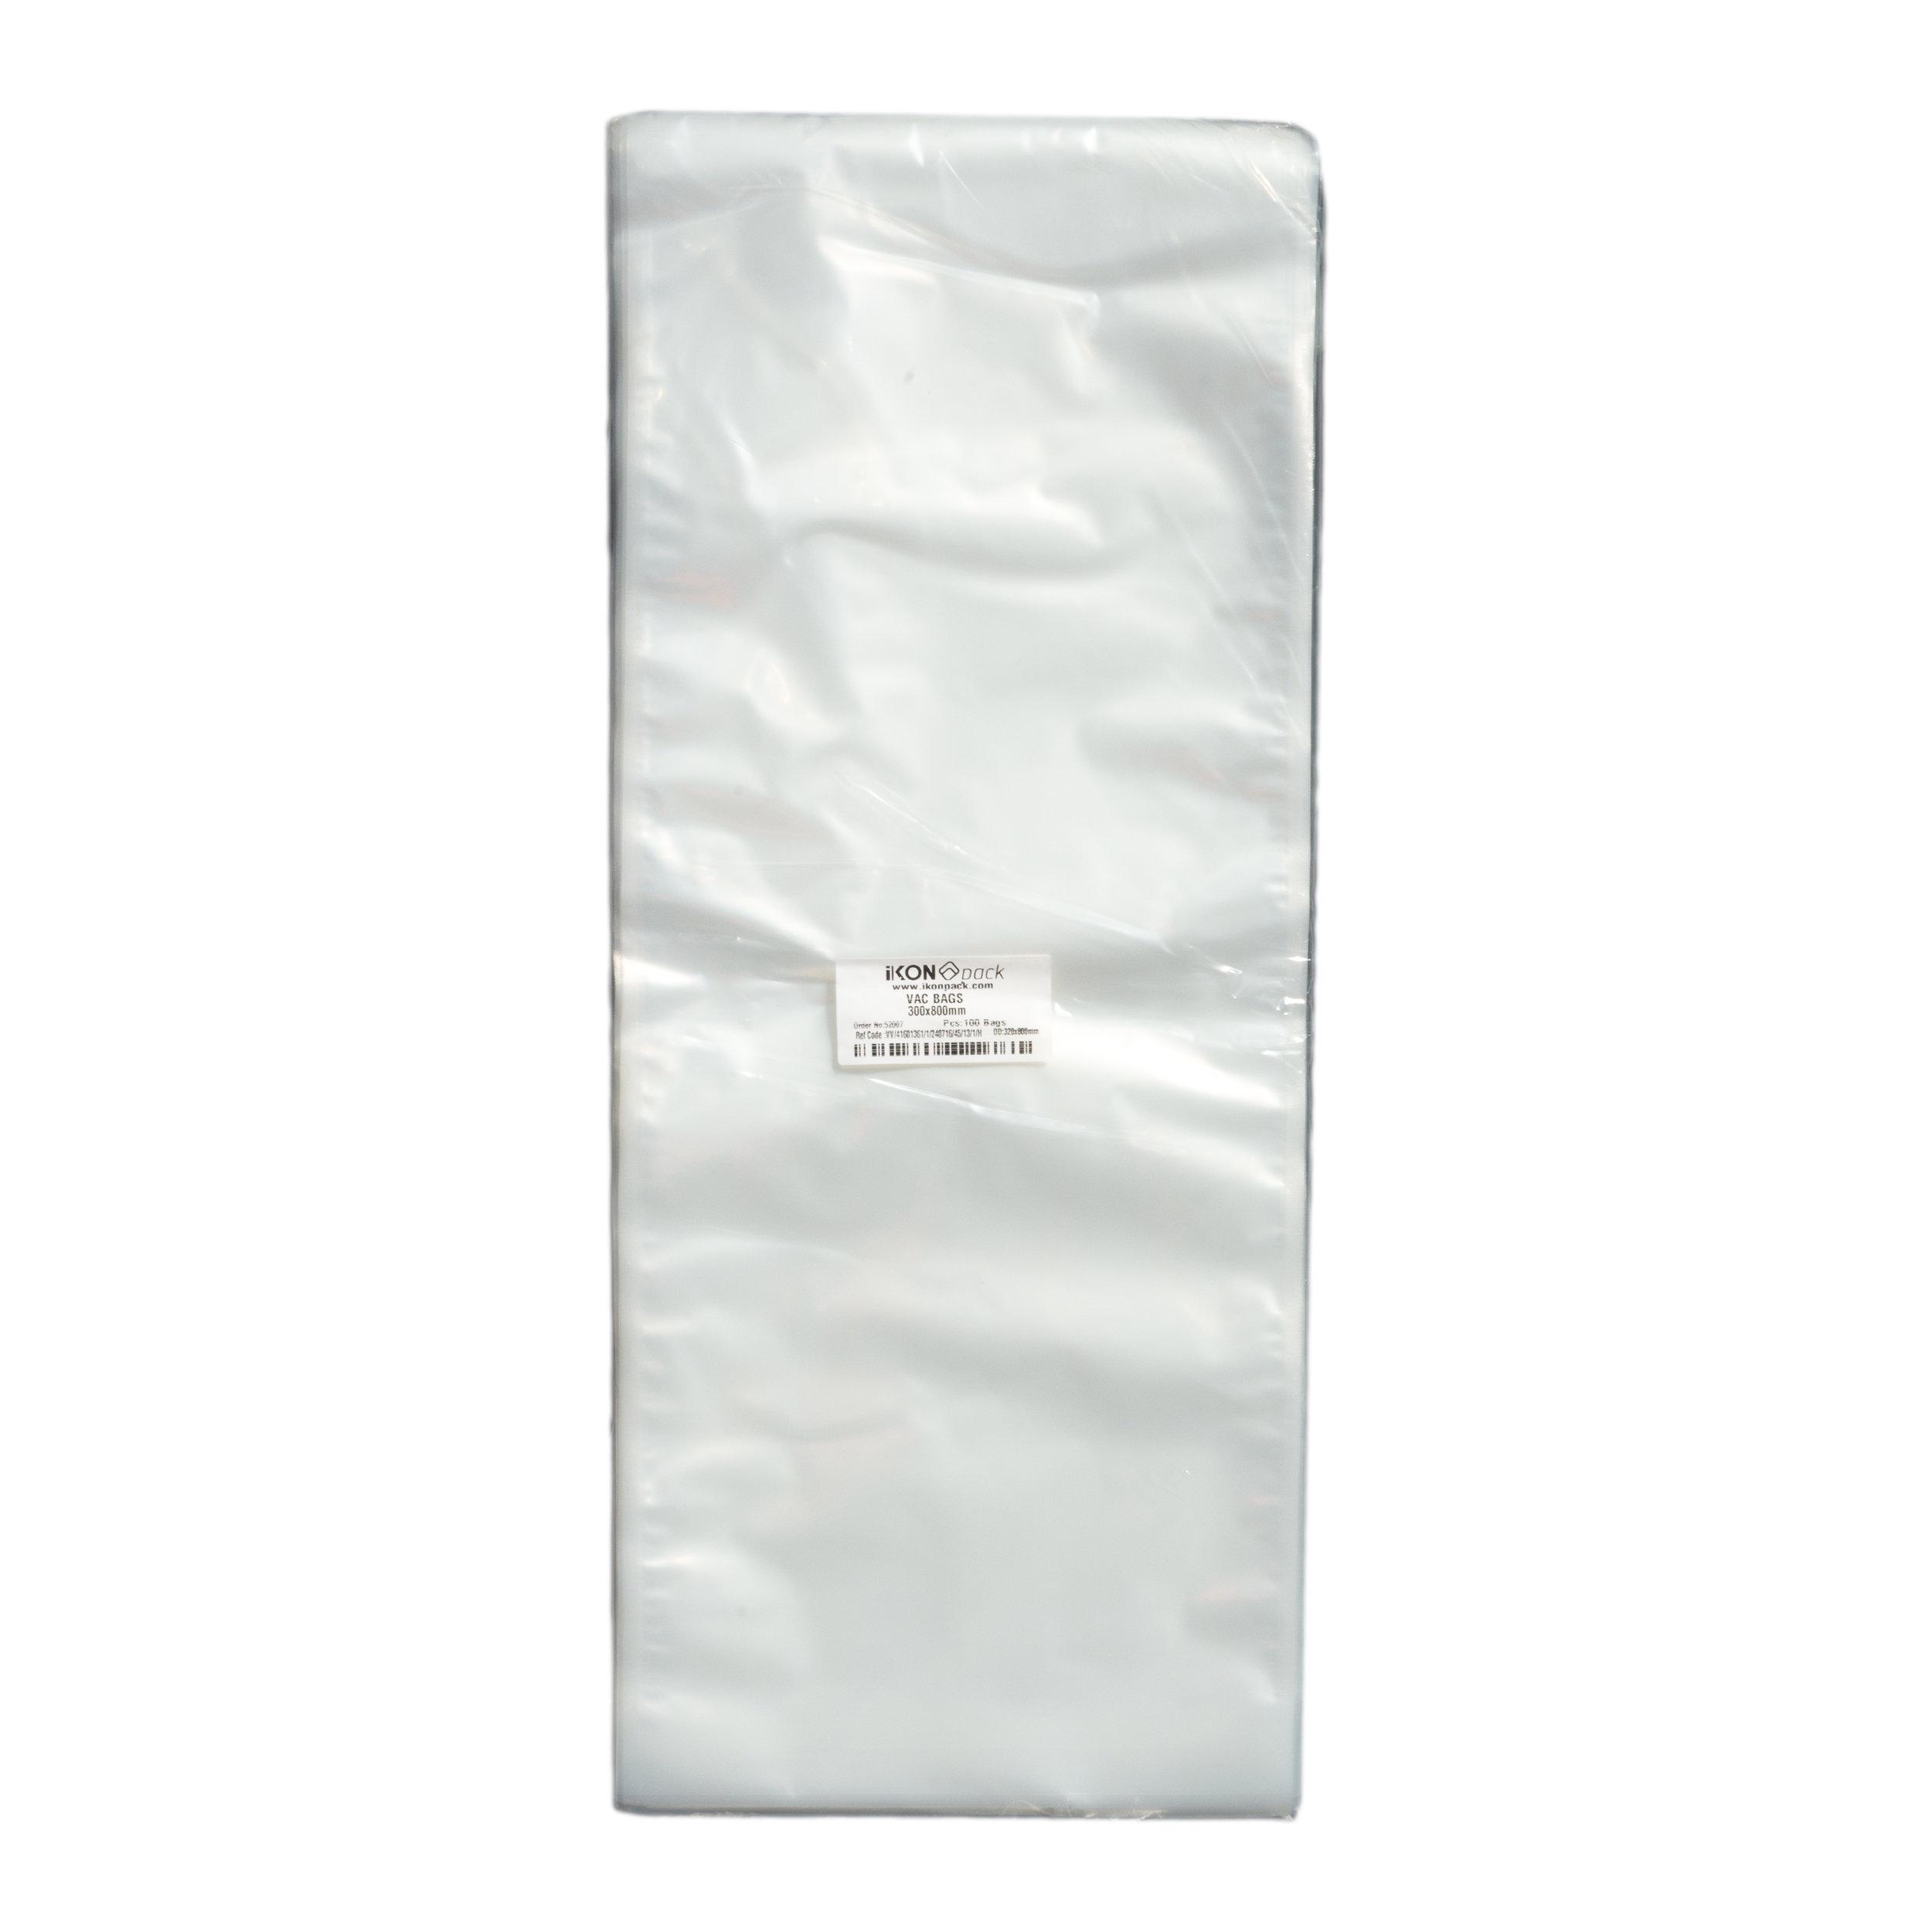 iK-VAC3080      VACUUM POUCH 70 MICRON 300X800    100 per slv 500 per carton